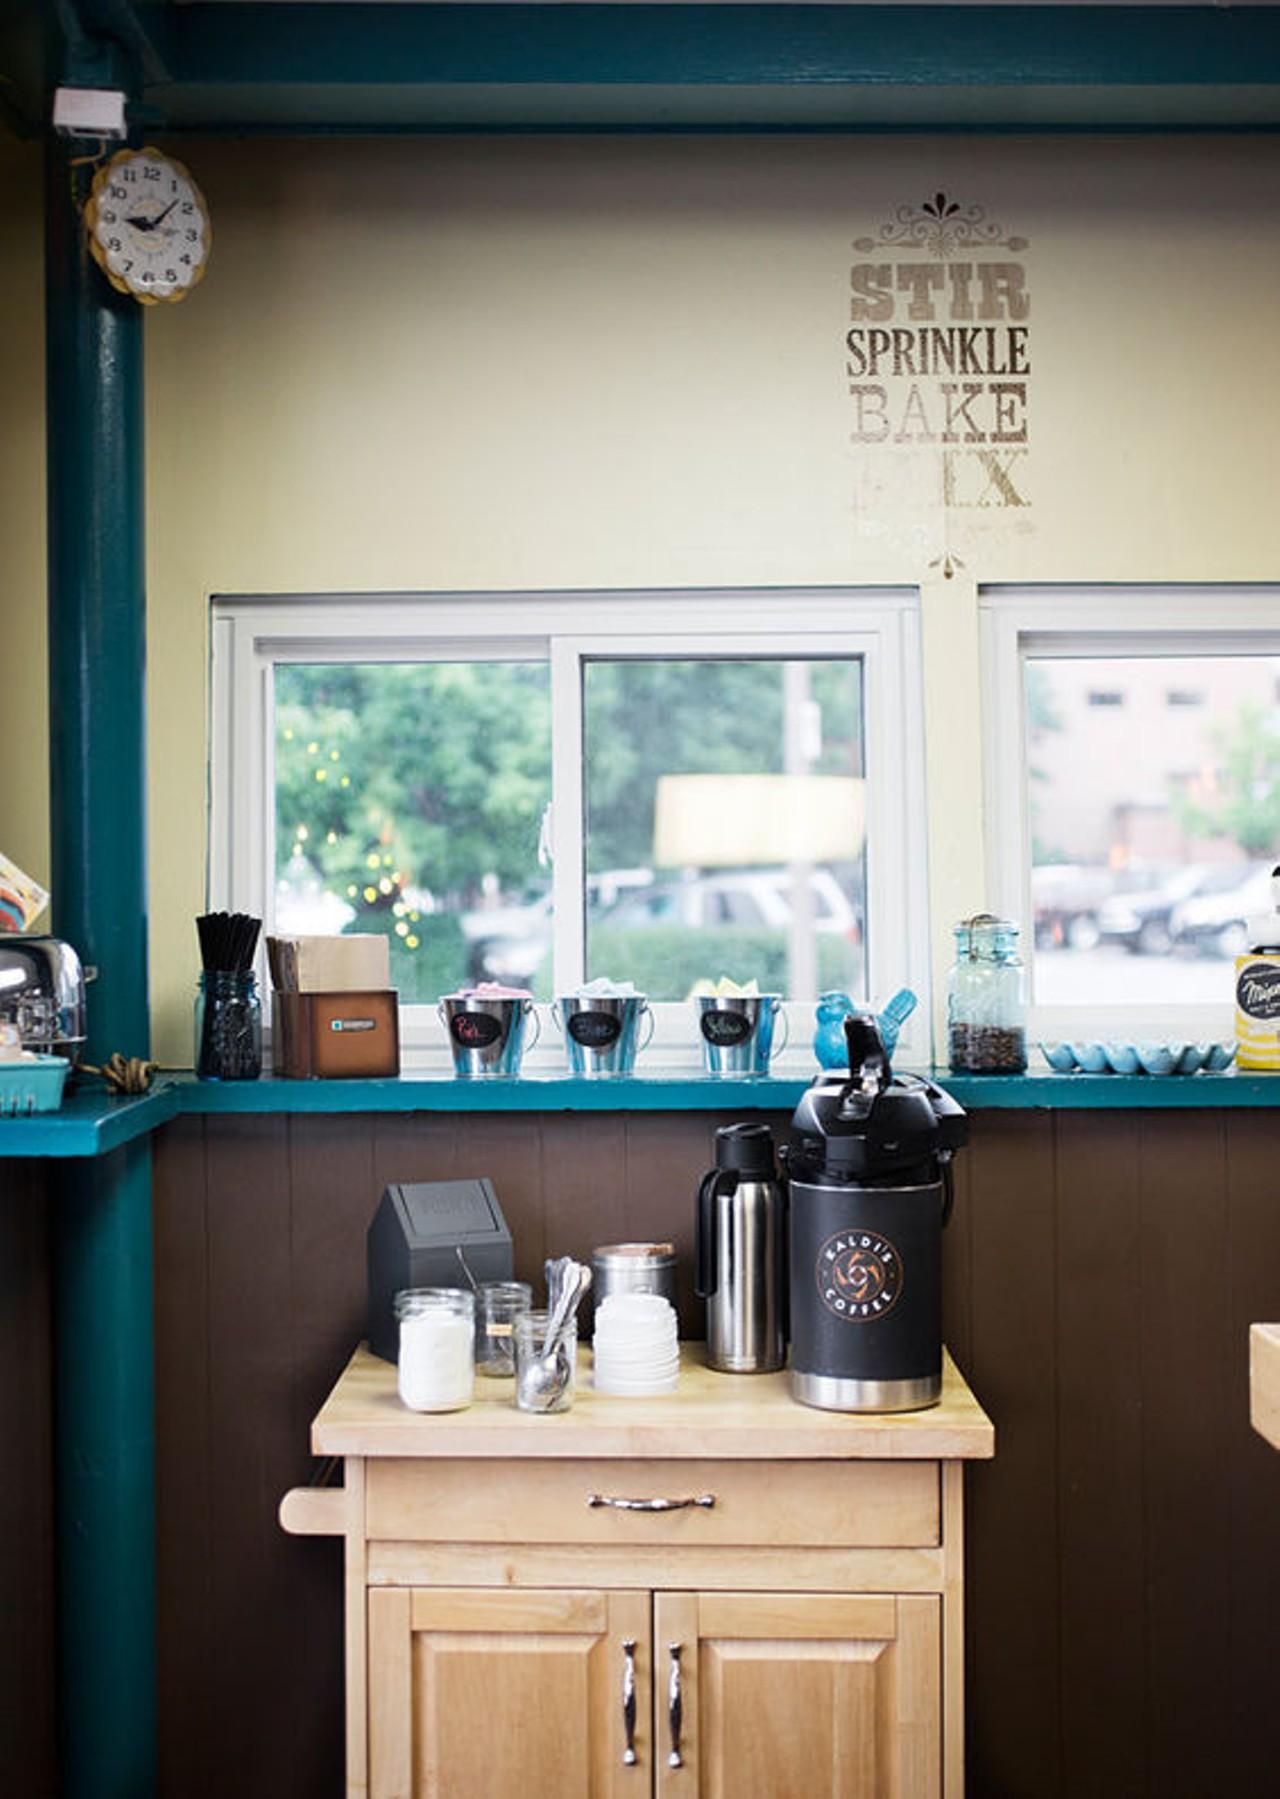 Pint Size Bakery & Coffee   St. Louis - St. Louis Hills   Bakery ...